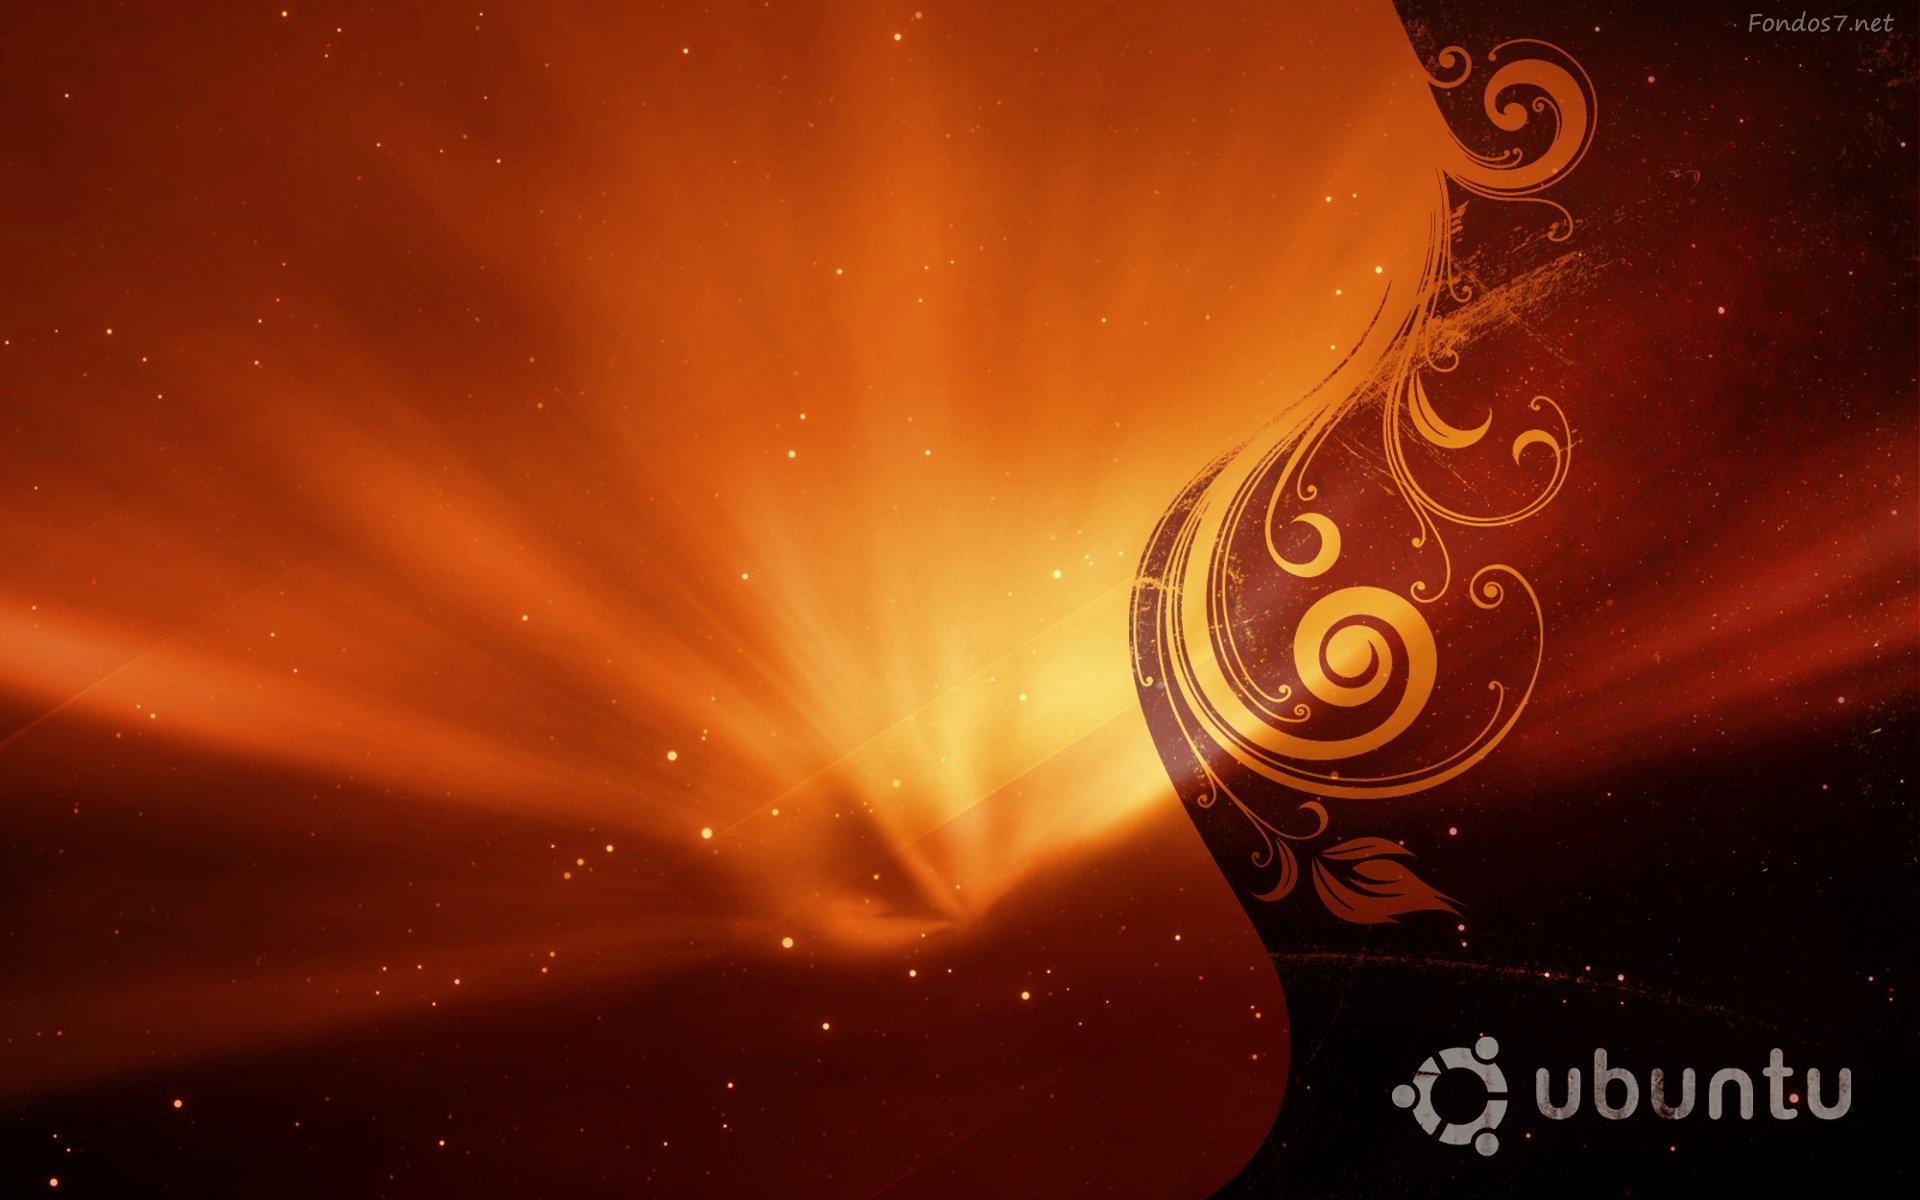 Ubuntu wallpaper 2012 1920x1200